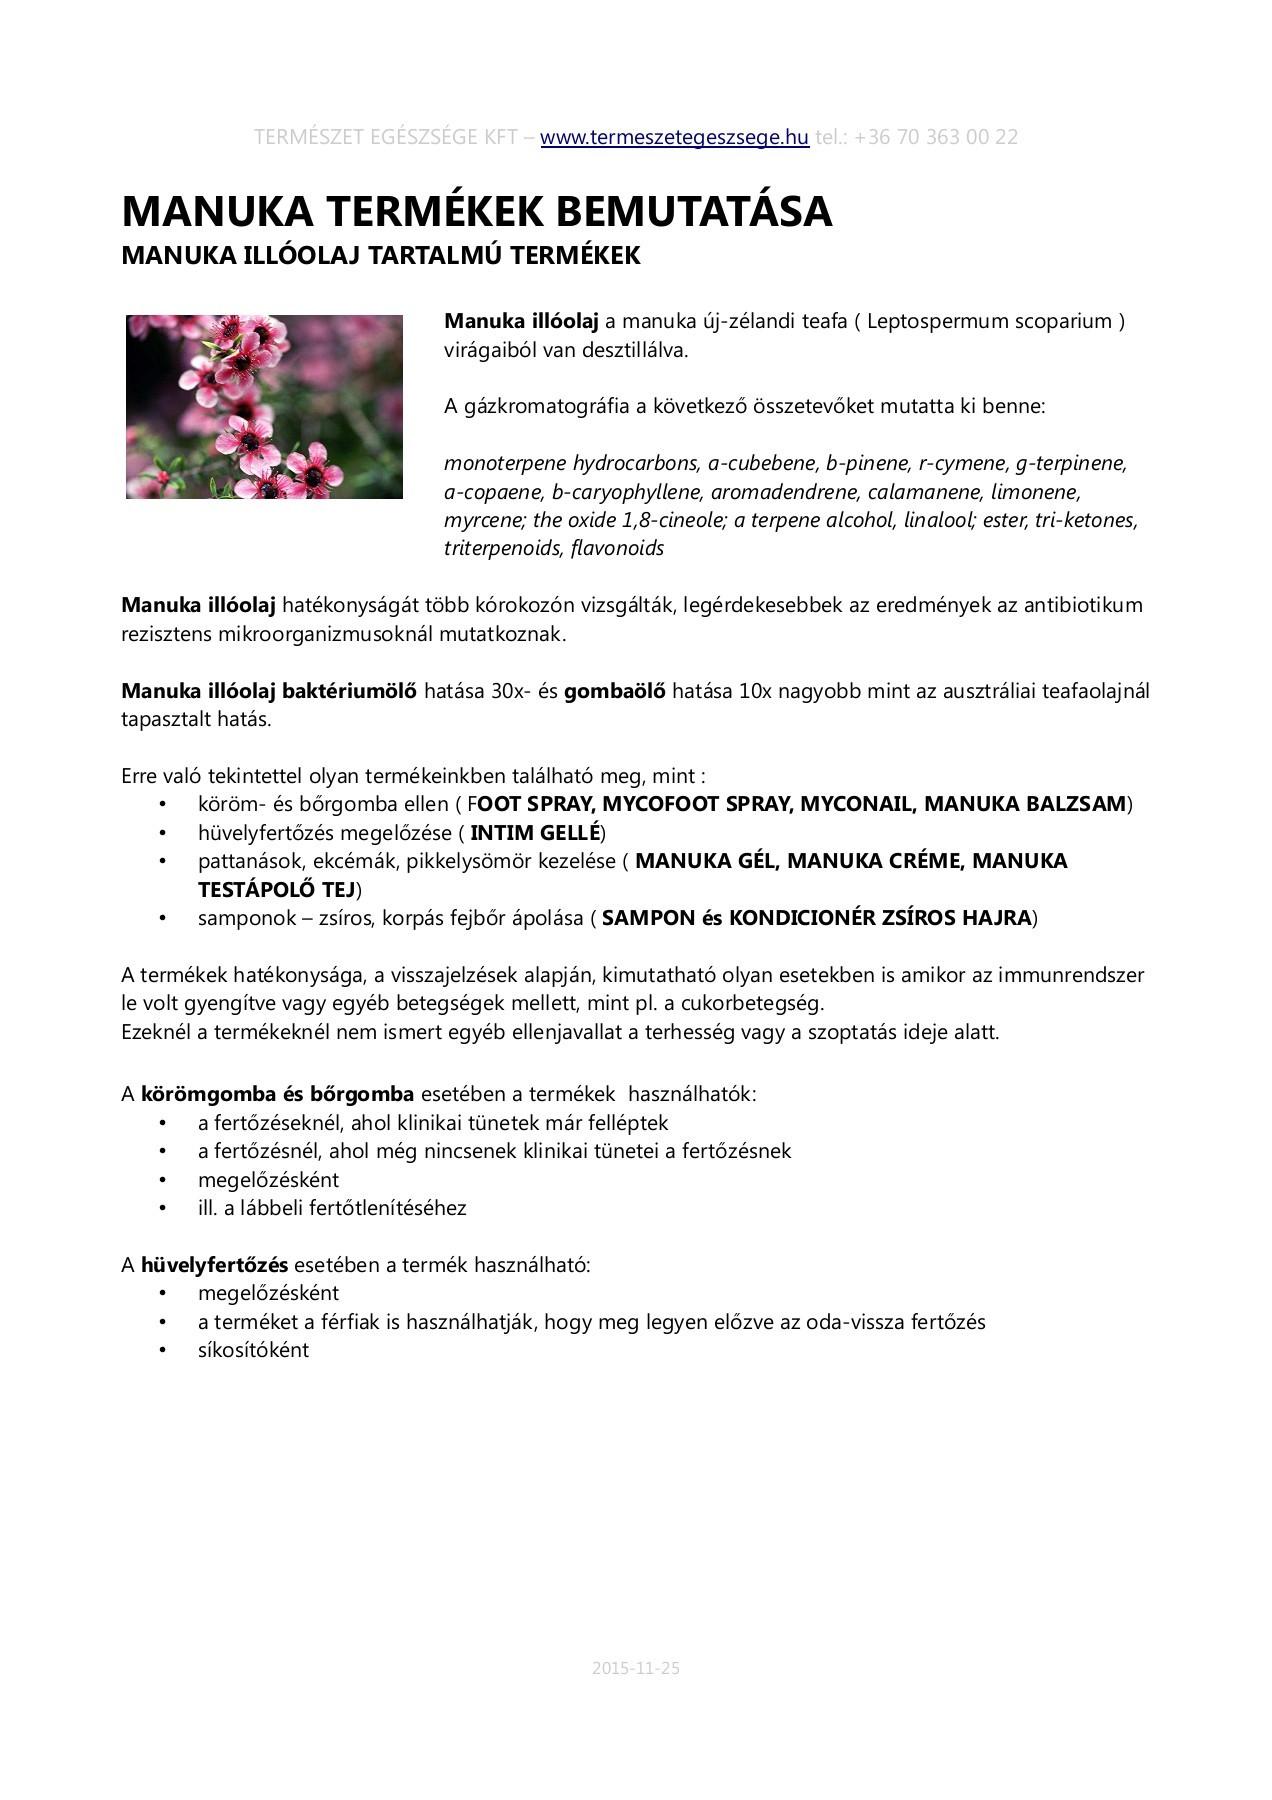 A legjobb orvosság a psoriasis